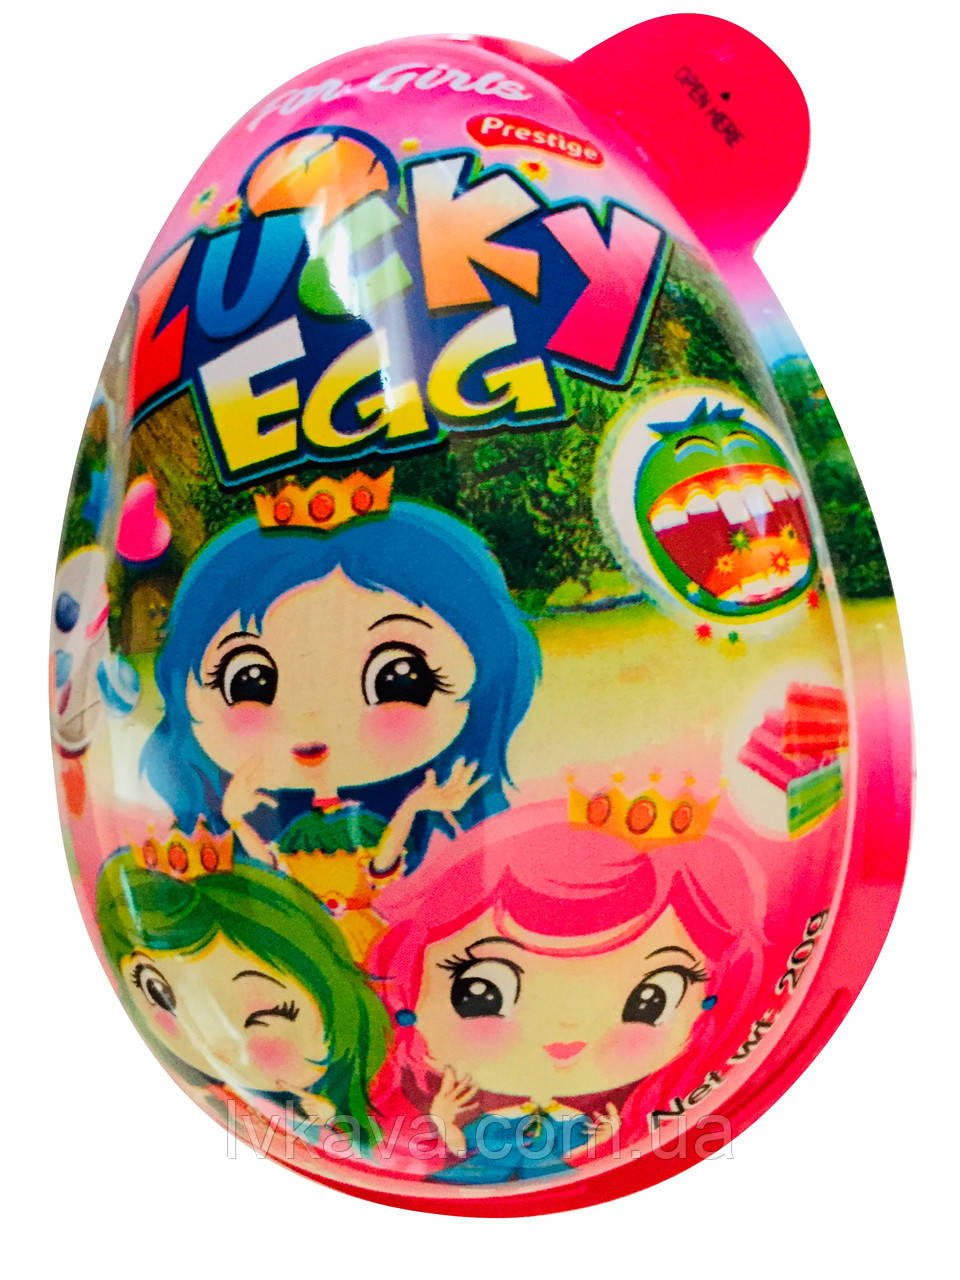 Яйцо-игрушка Big Egg Girl  Prestige, 20 g